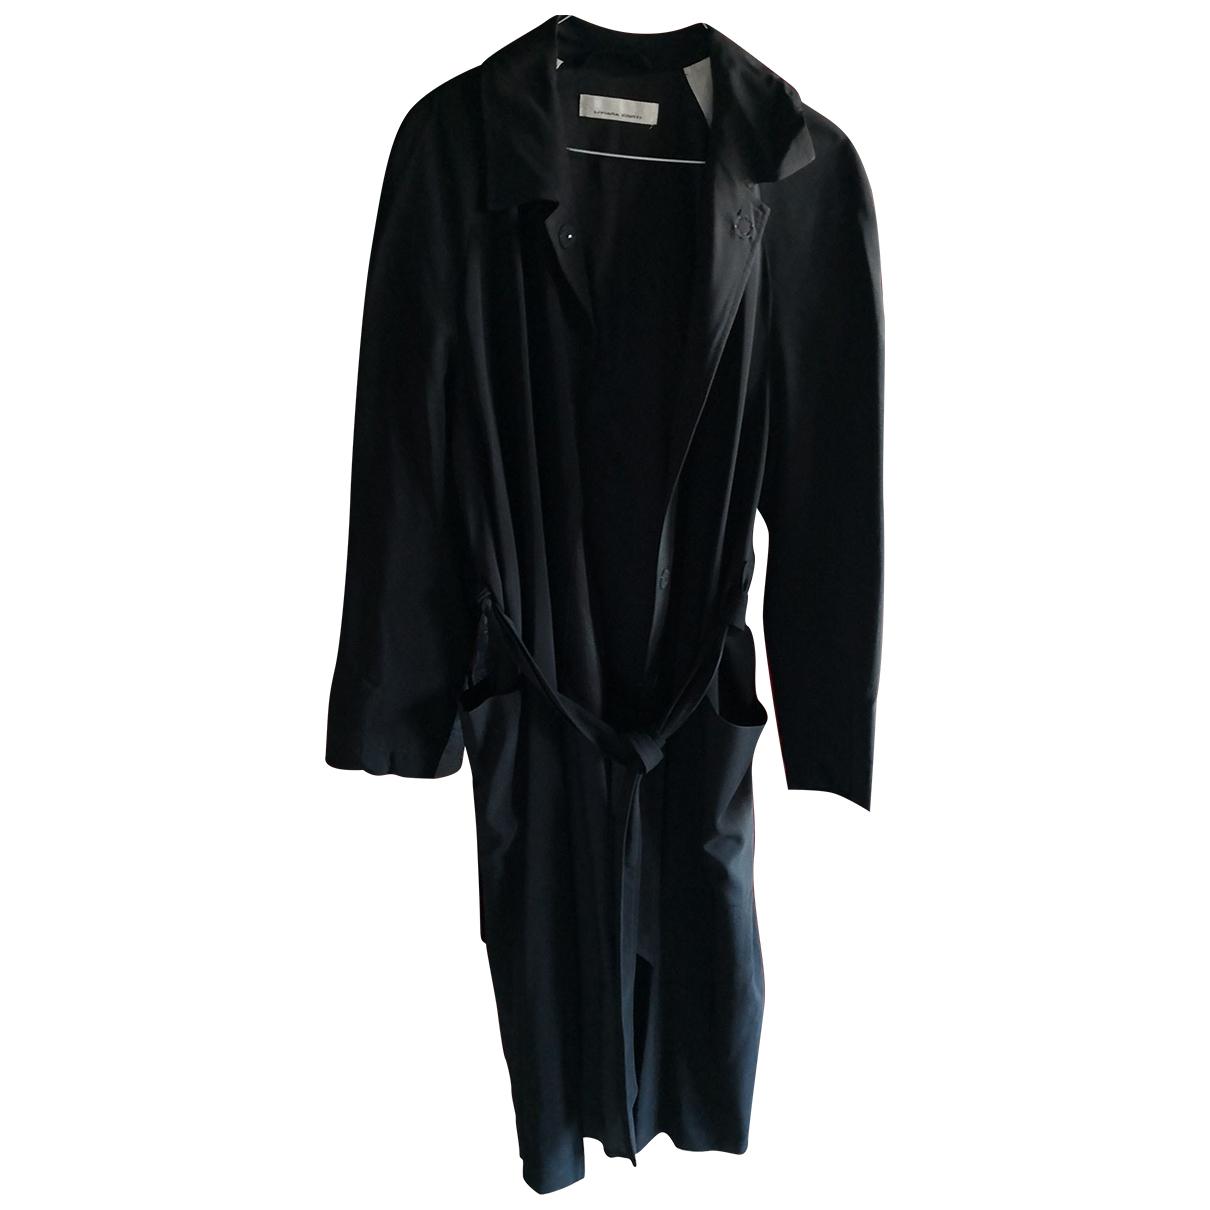 Liviana Conti \N Black coat for Women 44 IT